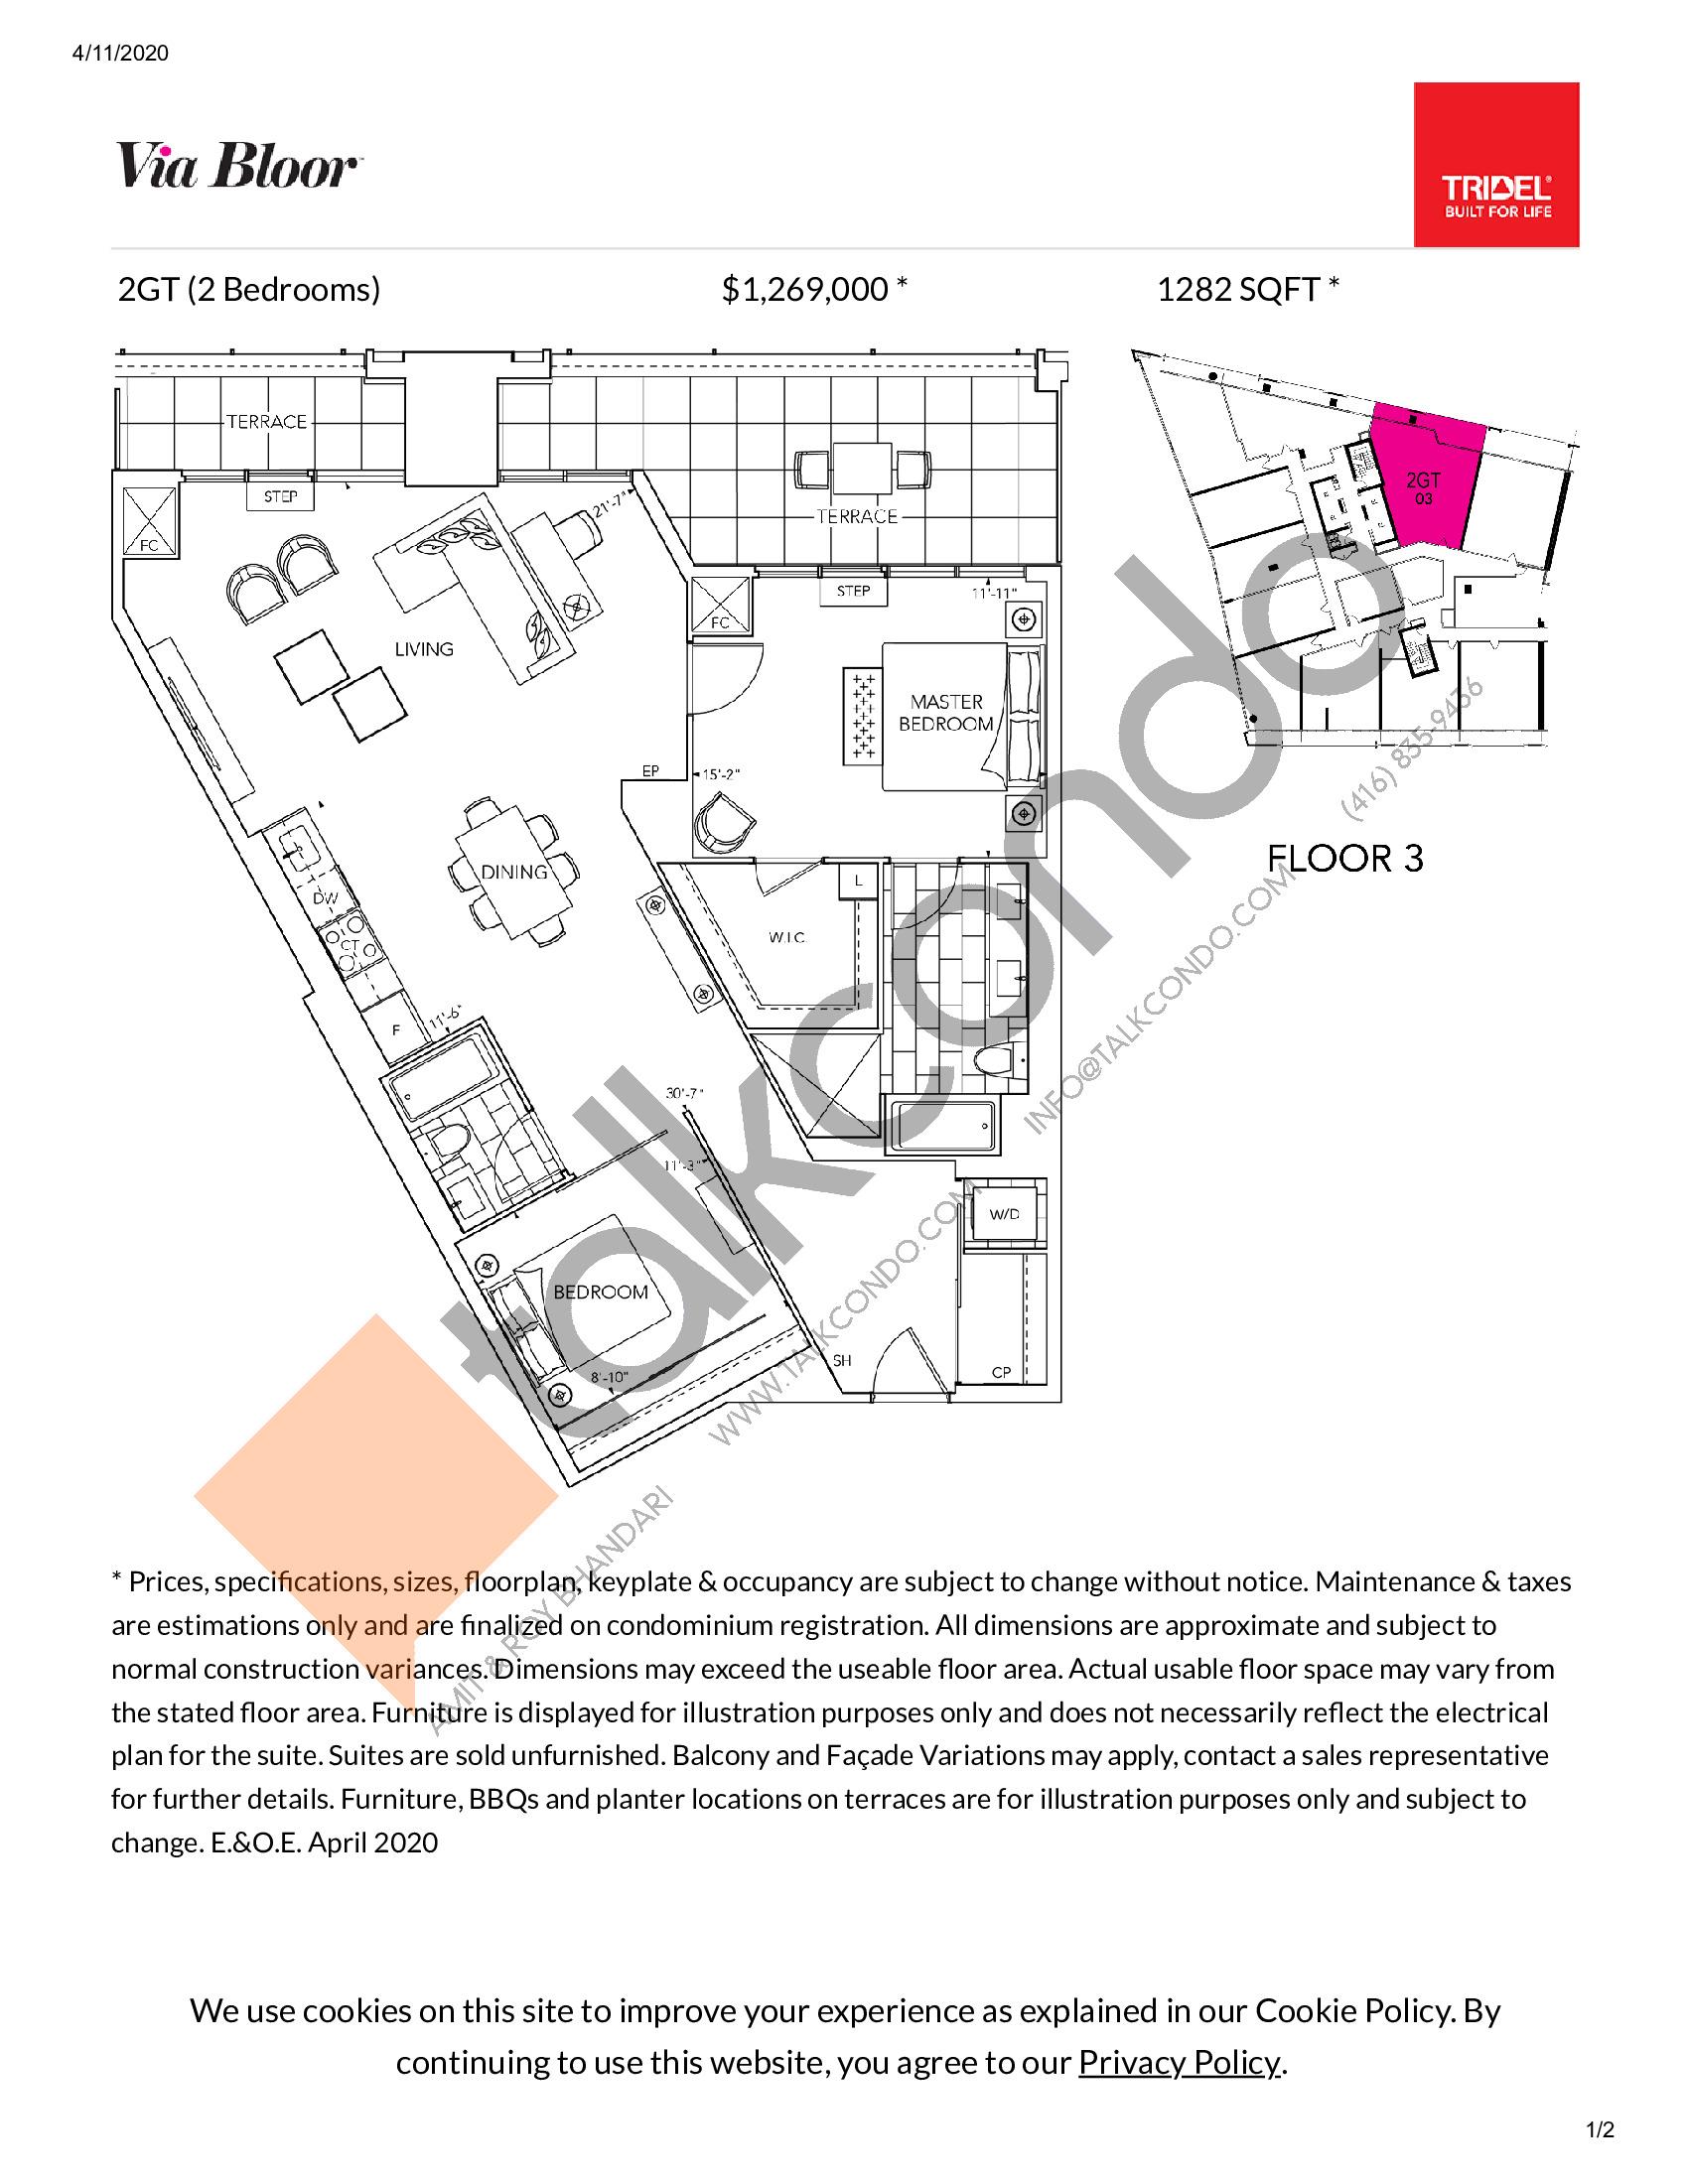 2GT Floor Plan at Via Bloor Condos - 1282 sq.ft